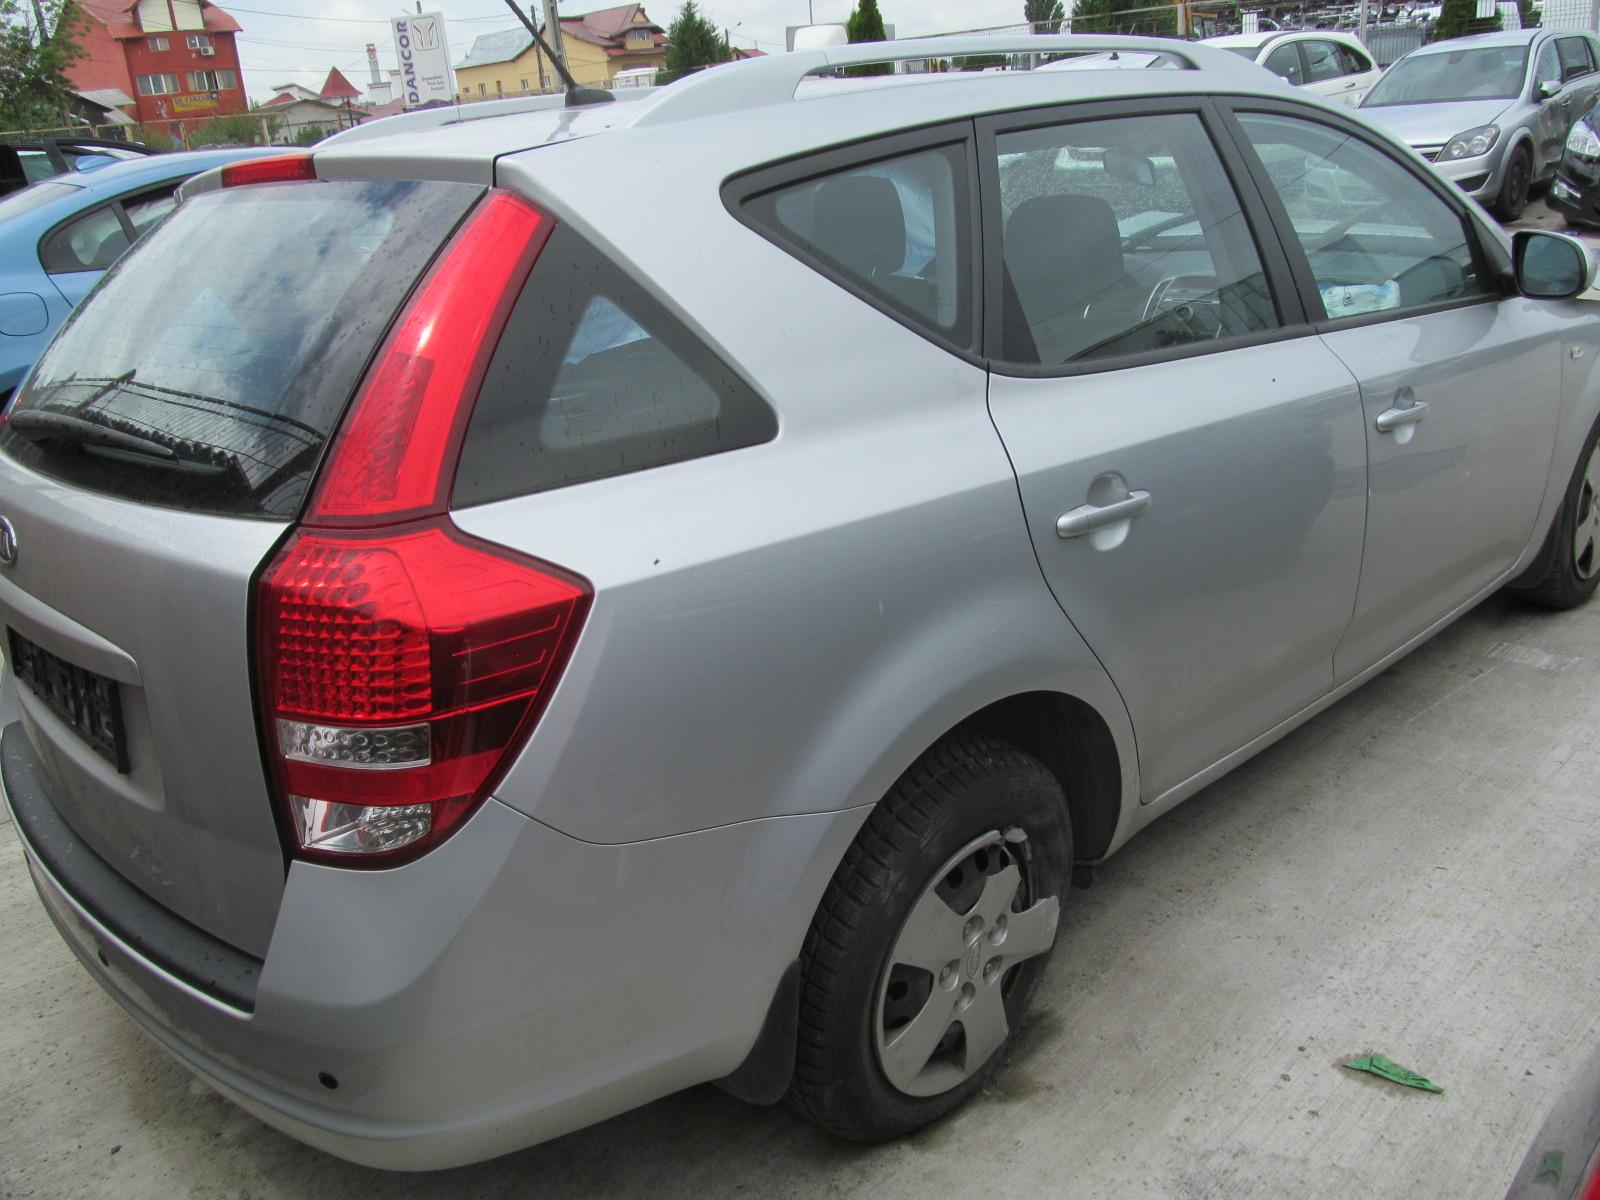 2010 Volkswagen Polo Vivo 1 4 ID1613vd moreover Mazda 3 Axela Hatchback 2009 as well 5278 further Mazda 3 Axela Sedan 2009 likewise Focus. on 2010 mazda 6i interior